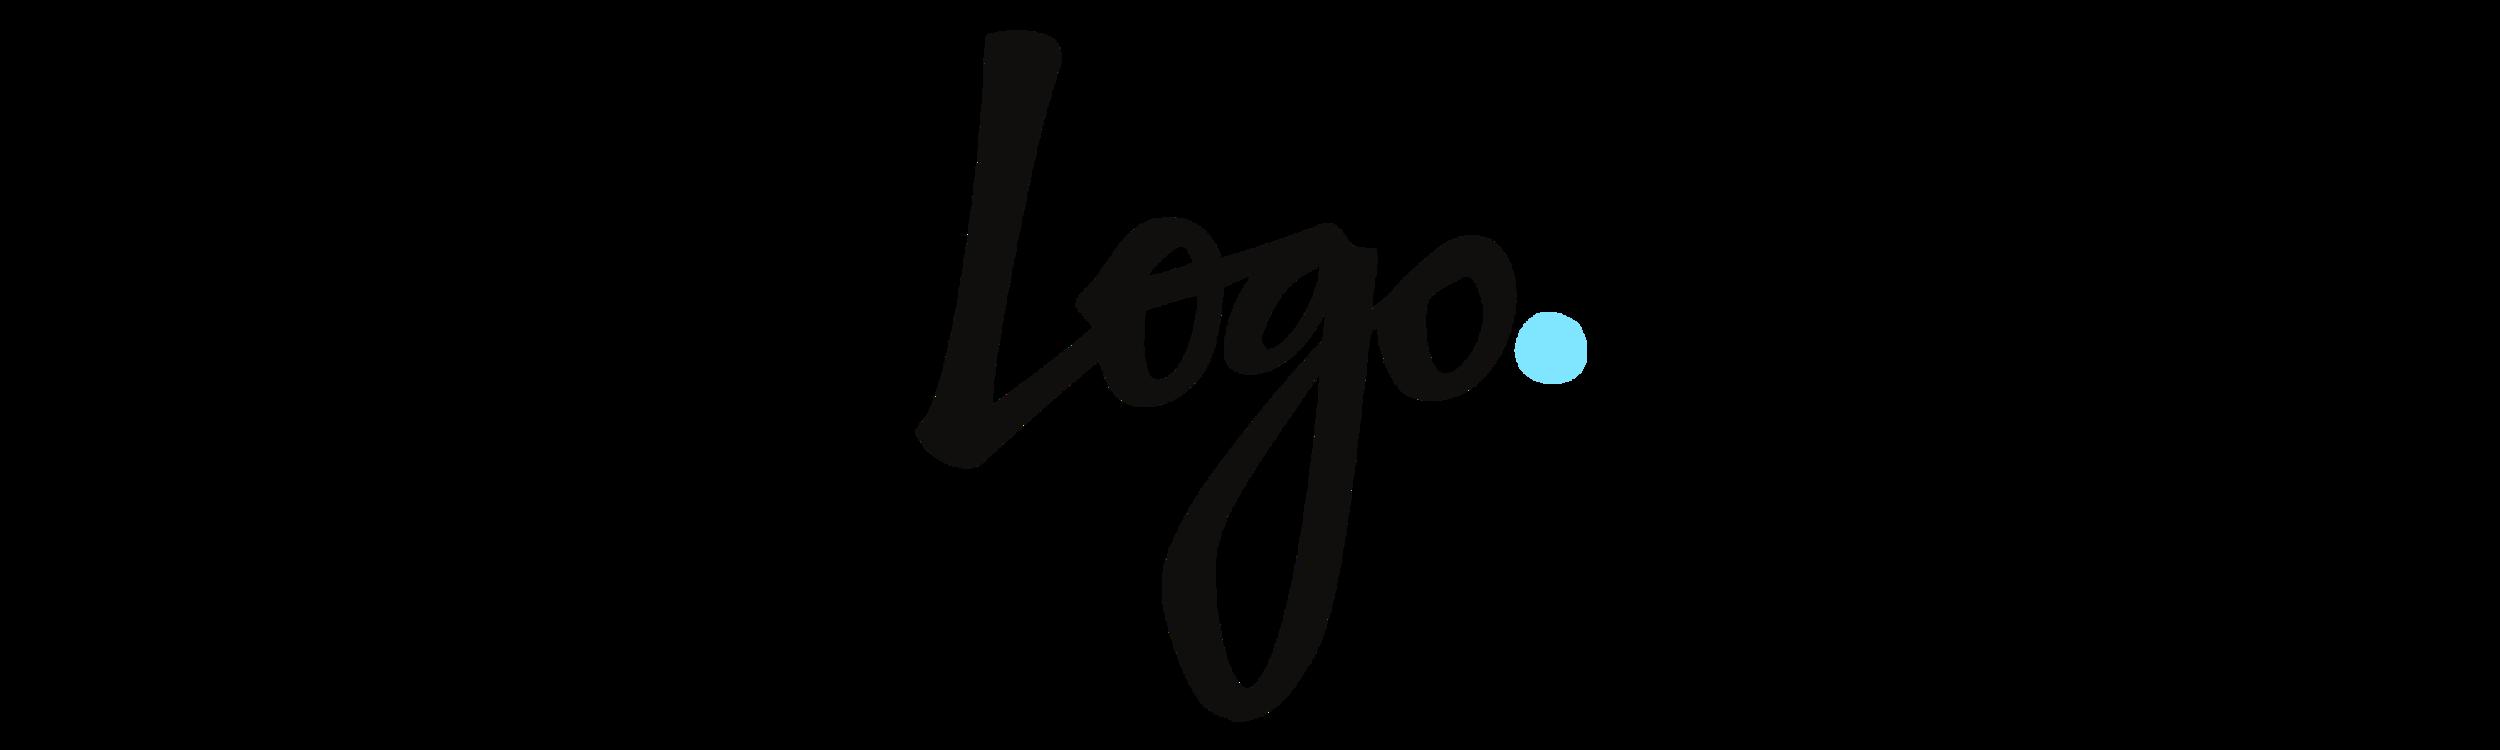 Press Logos-01.png